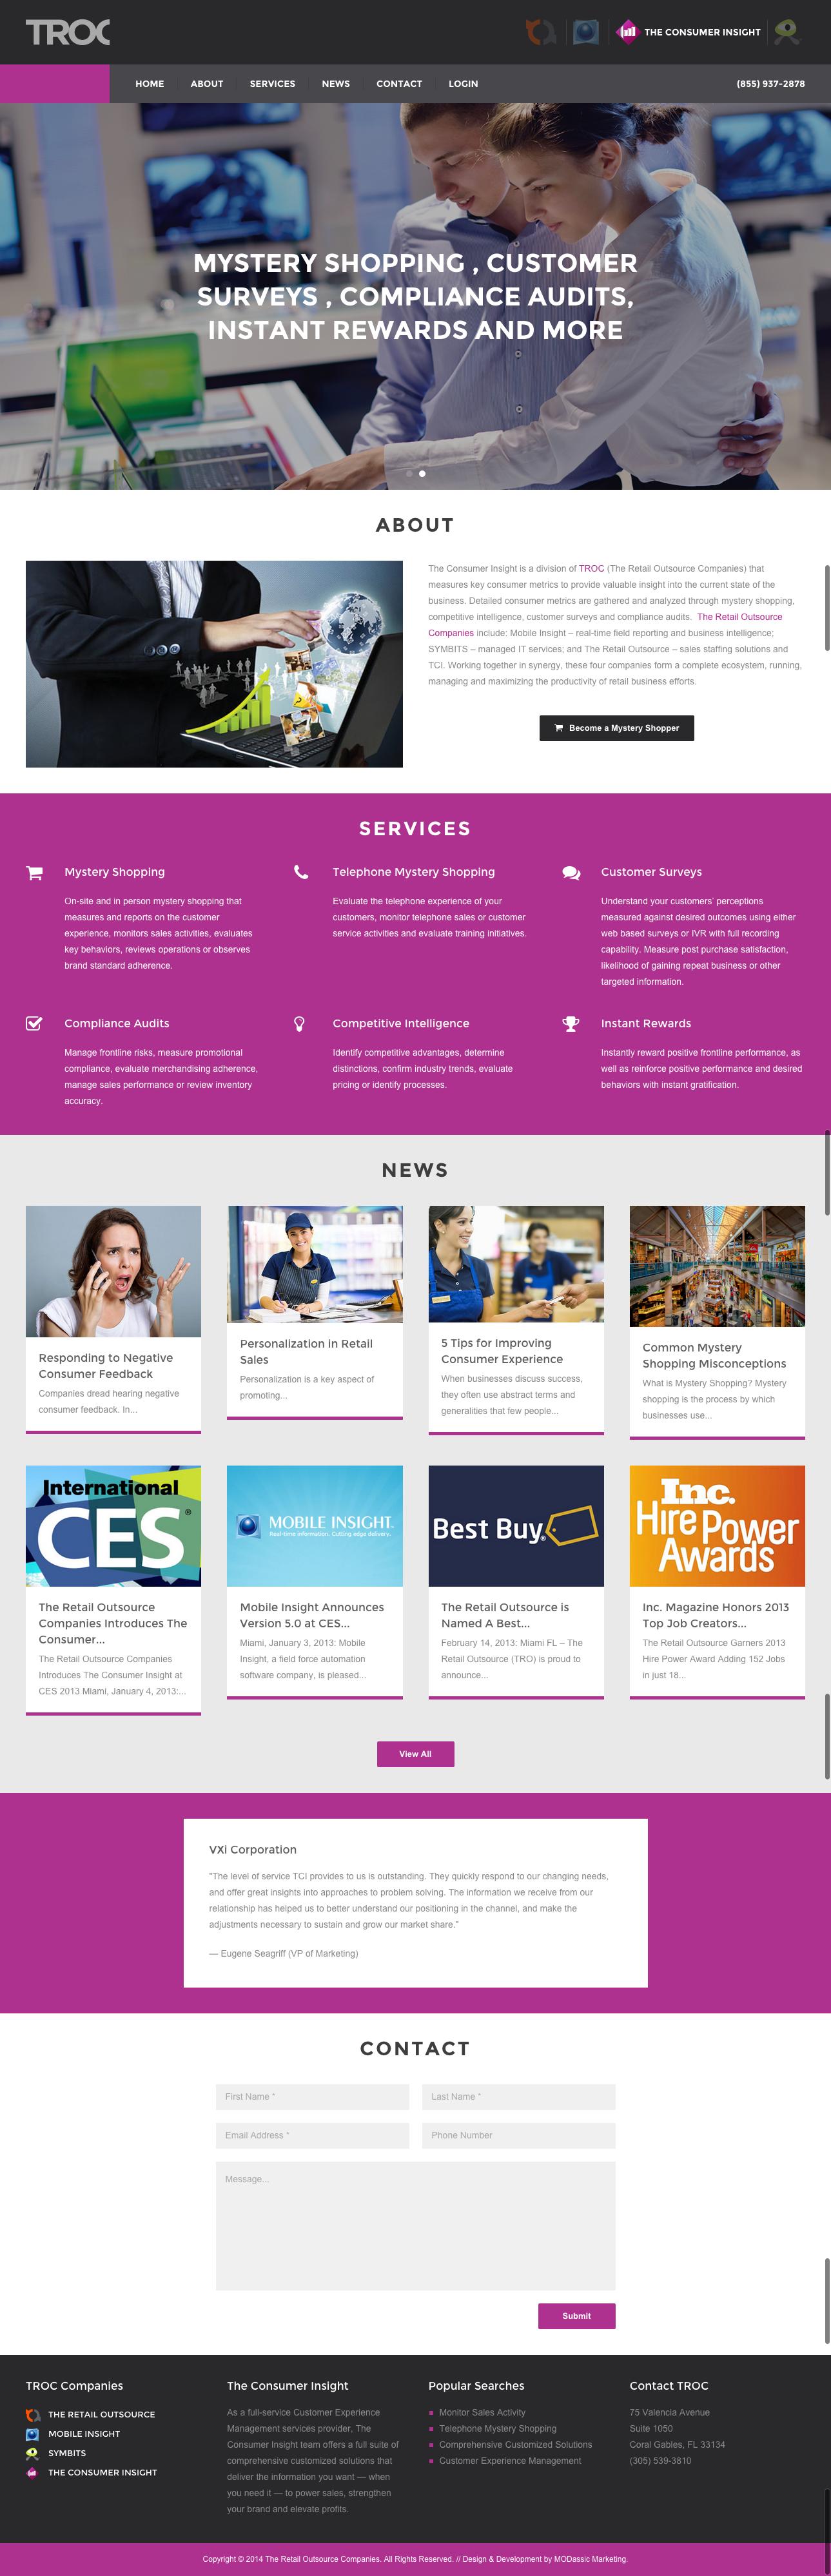 Dallas Marketing Agency Responsive Web Design Web Design Responsive Web Design Design Strategy